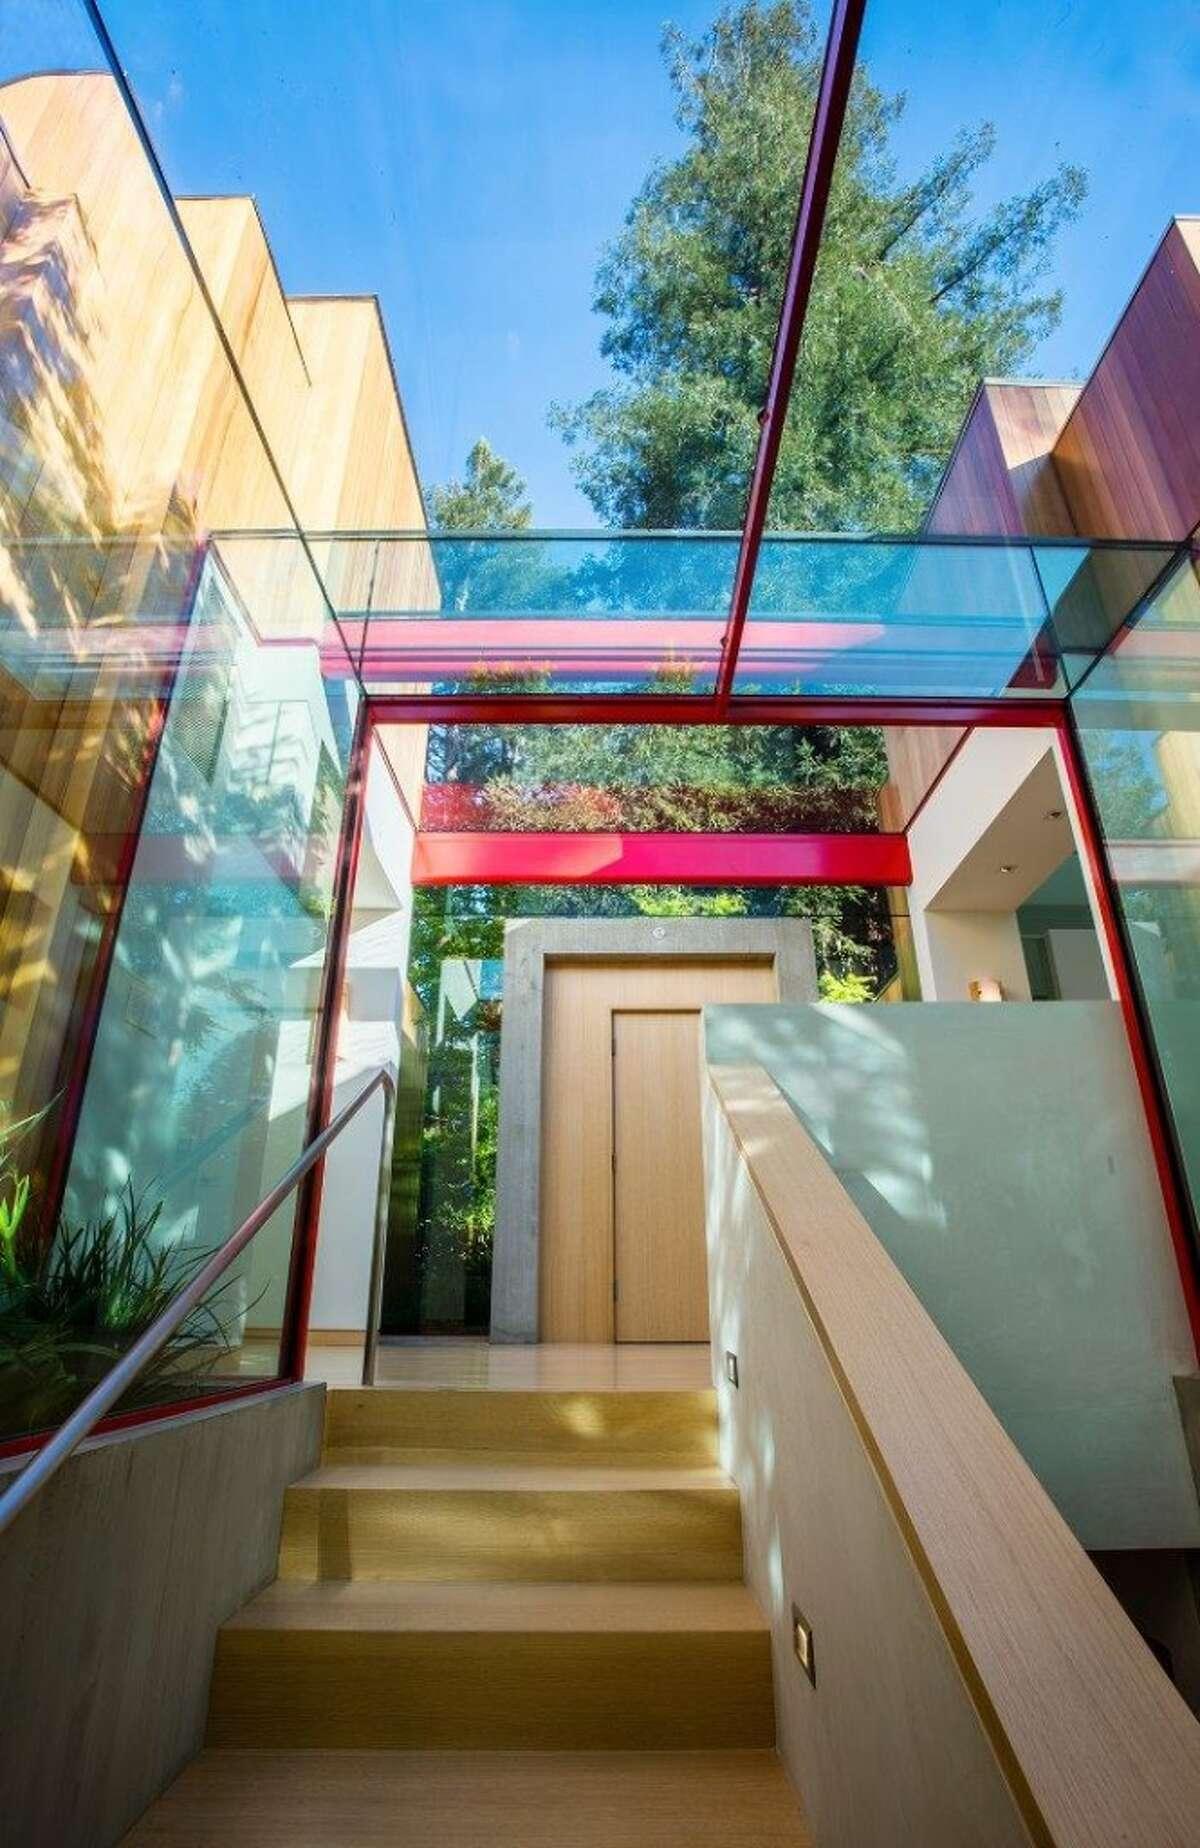 Glass entry. Photos: MLS/Estately